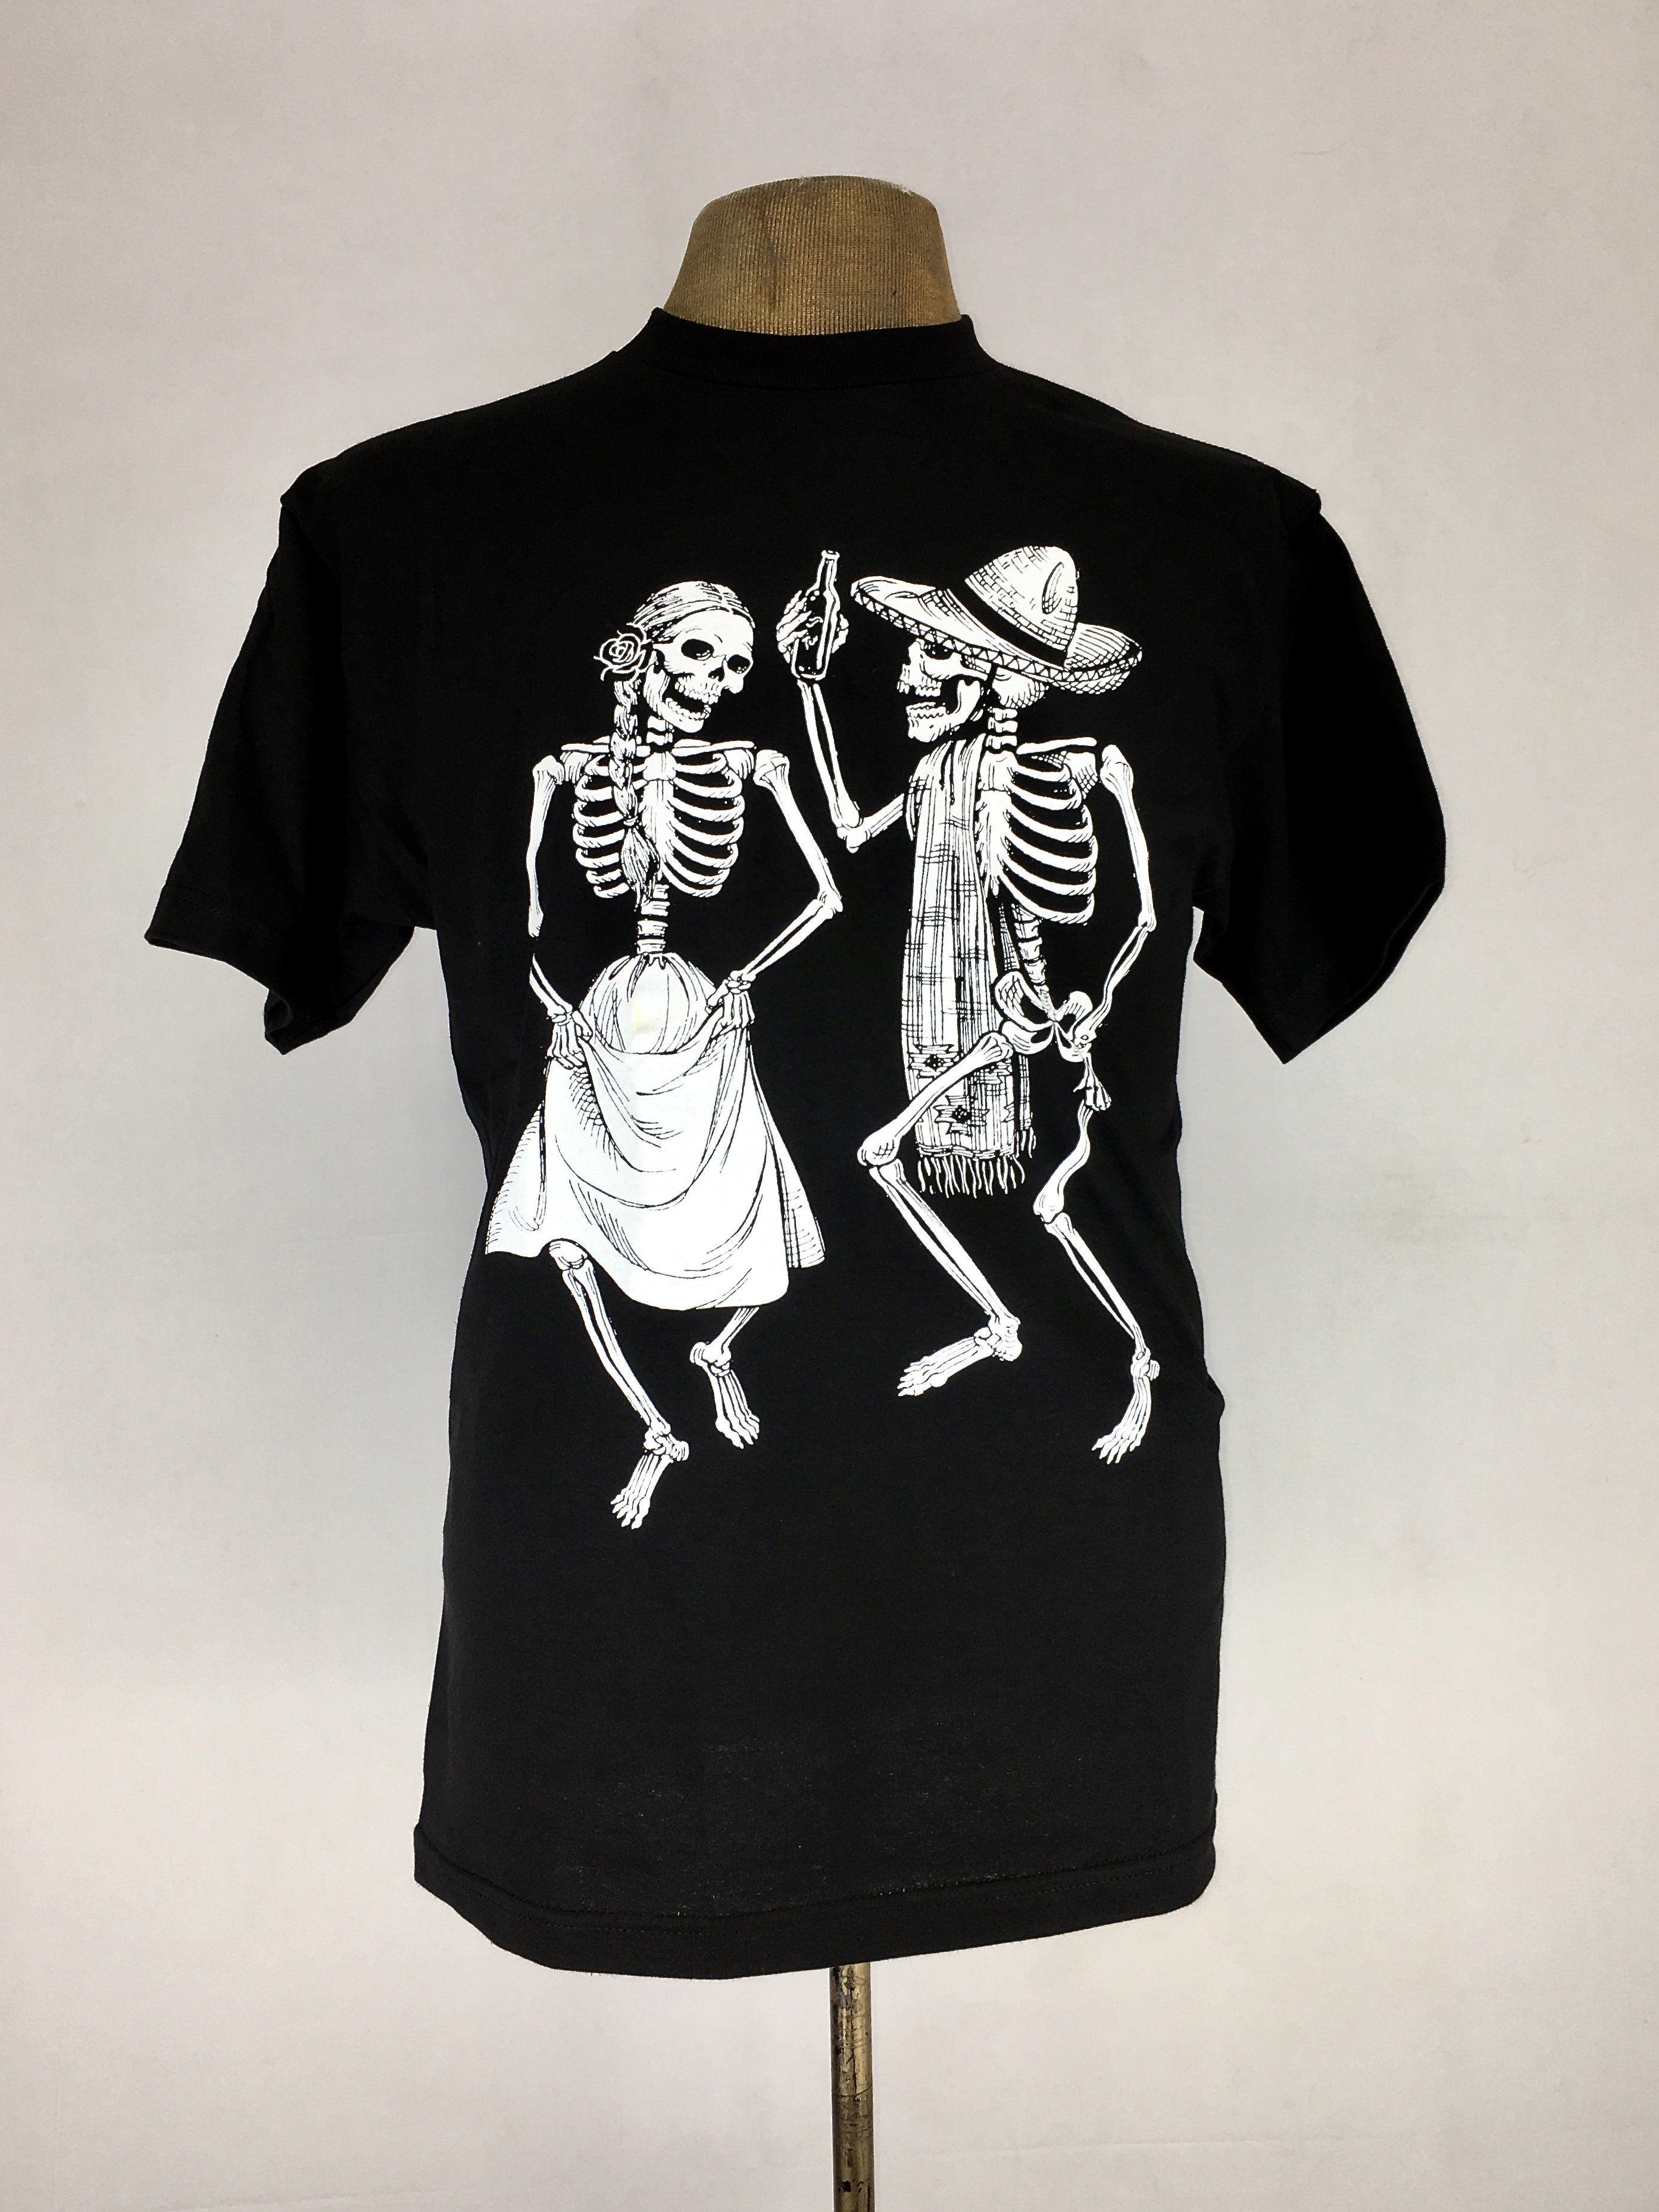 Dancing couple die de los muertos inspired tee